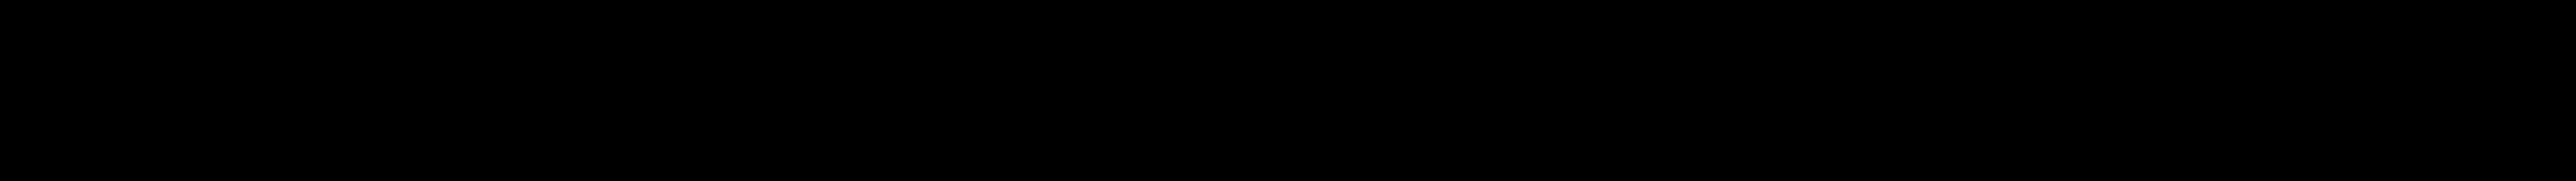 Rogue Sans Extended Pro Light